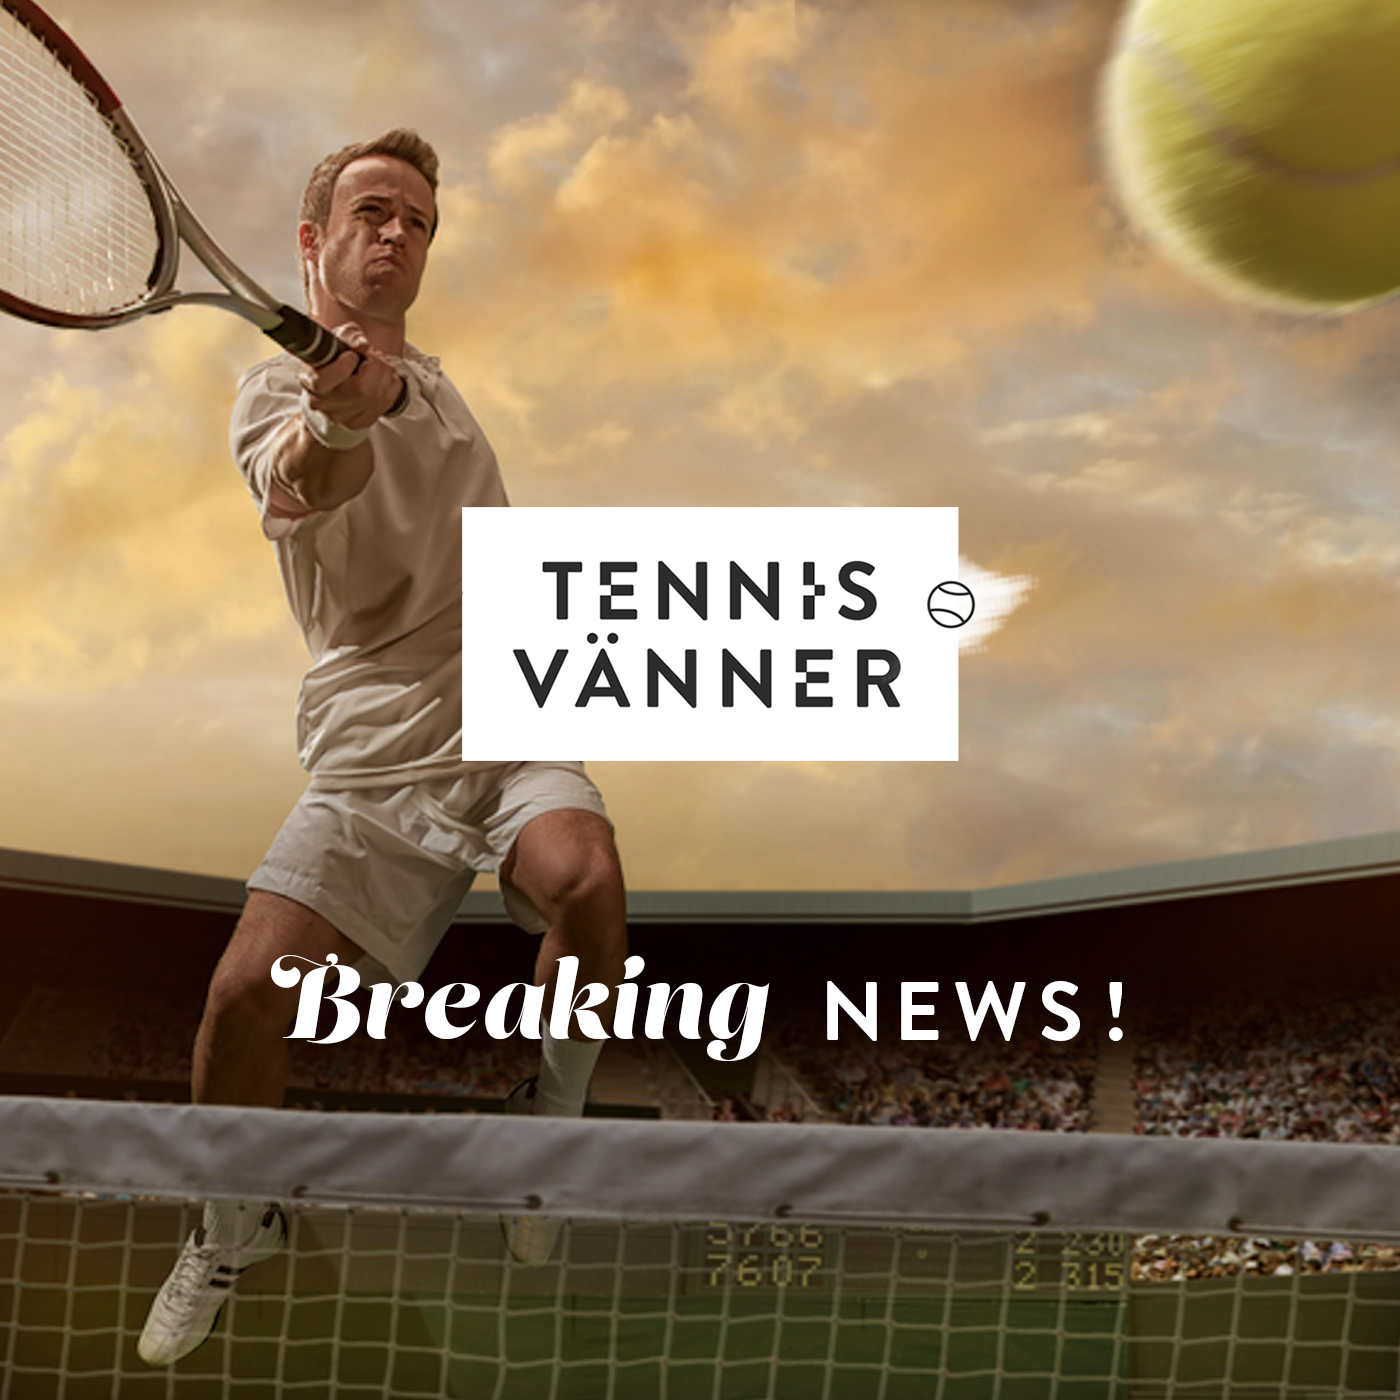 Avsnitt 29. Breaking News - tryck Play/Listen in browser på ljudfilen nedan